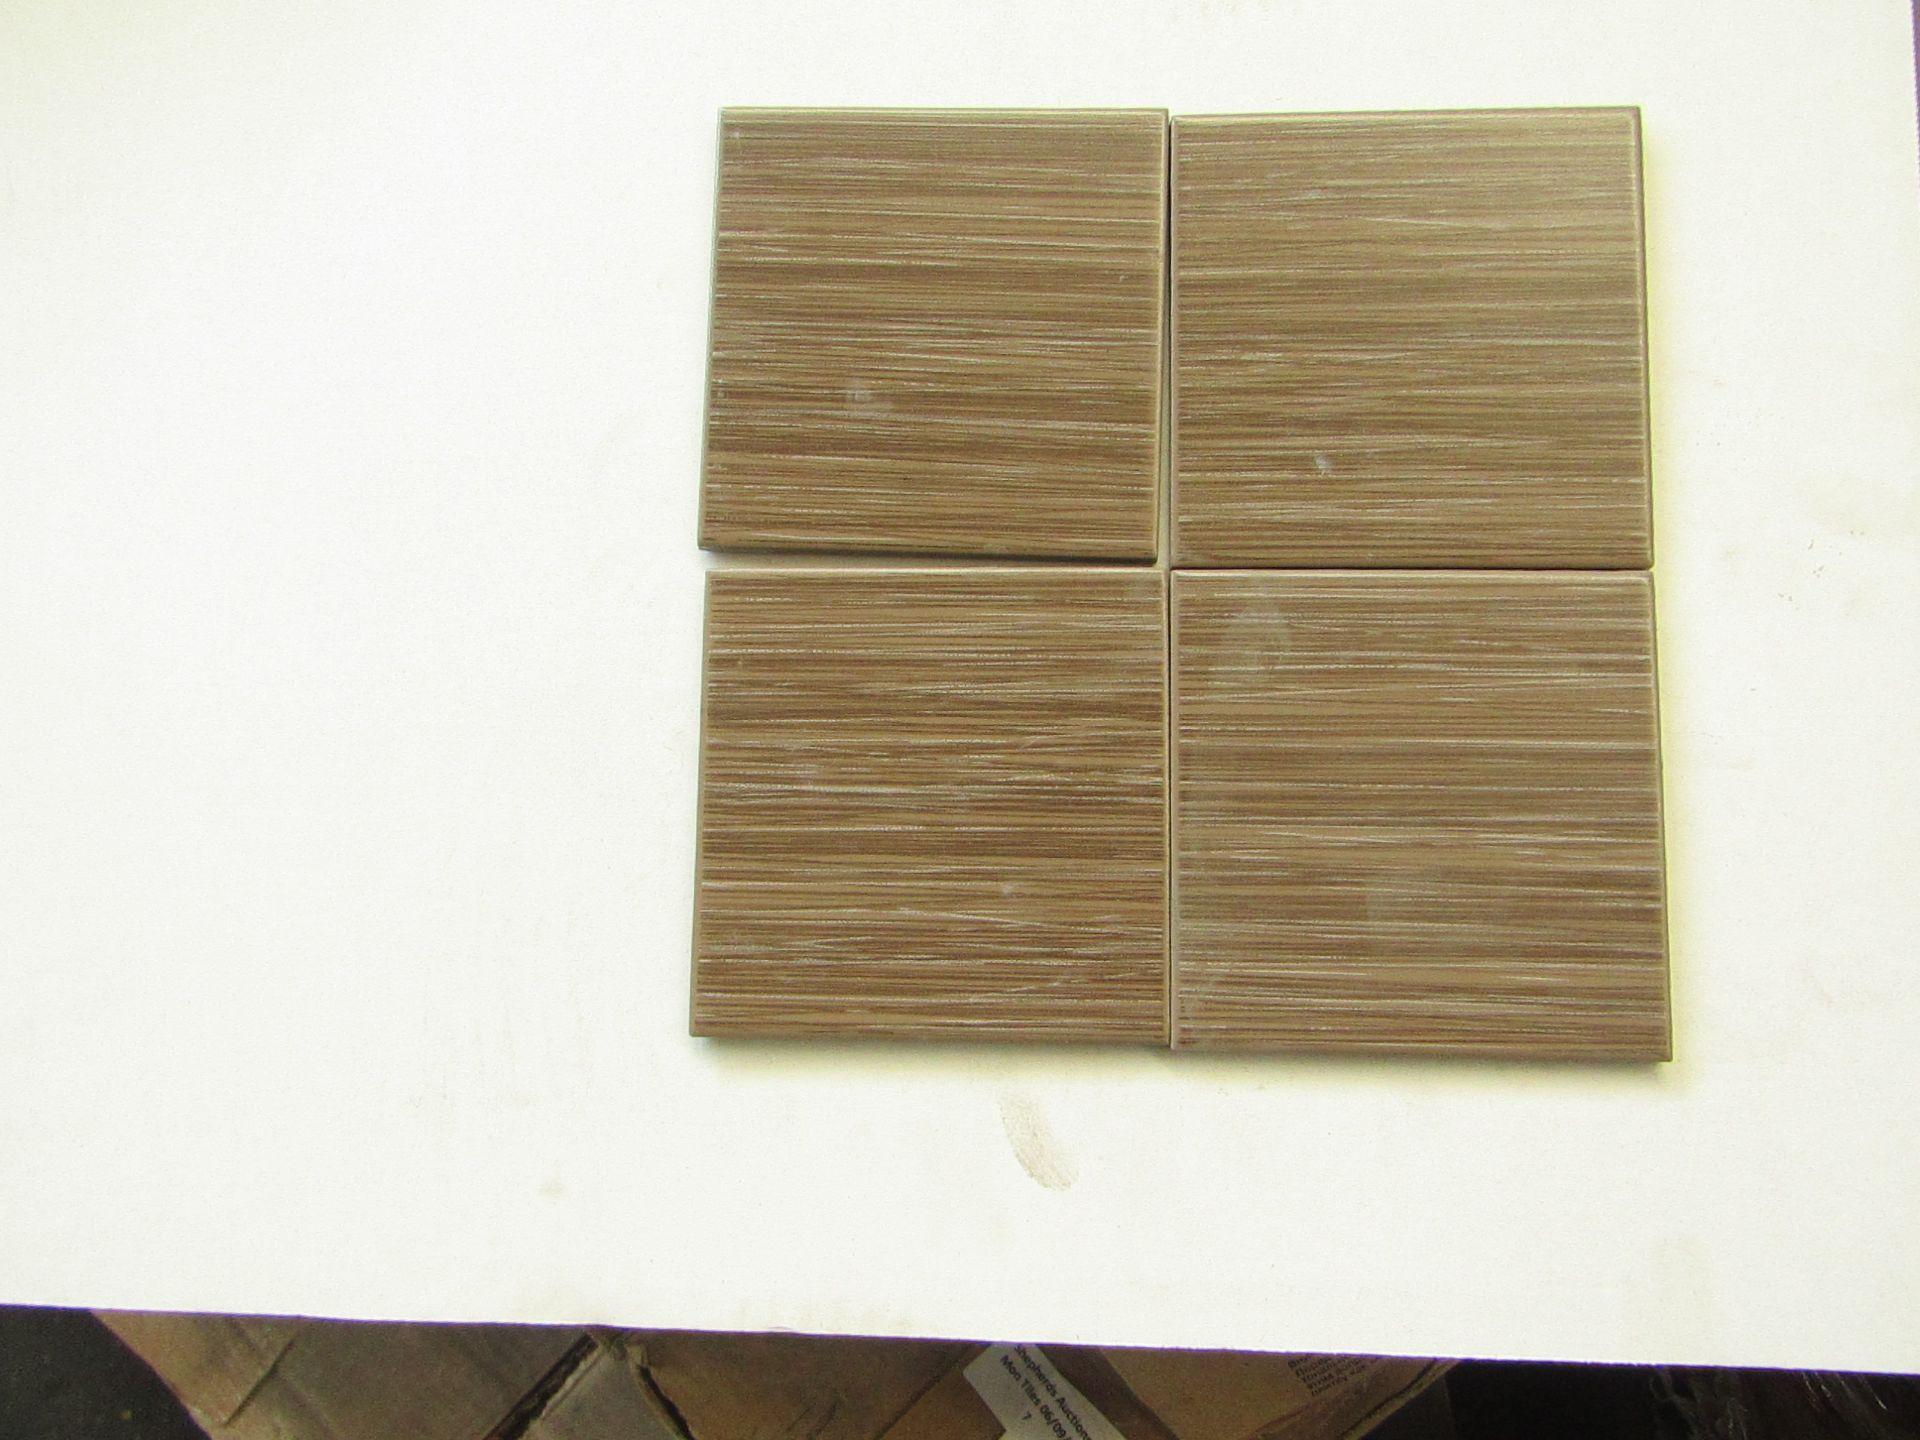 10x Boxes of 50 Vitra Elegant Mocha (K334411) tiles 100 x 100 x 6mm, brand new. Total RRP £22 a Box,